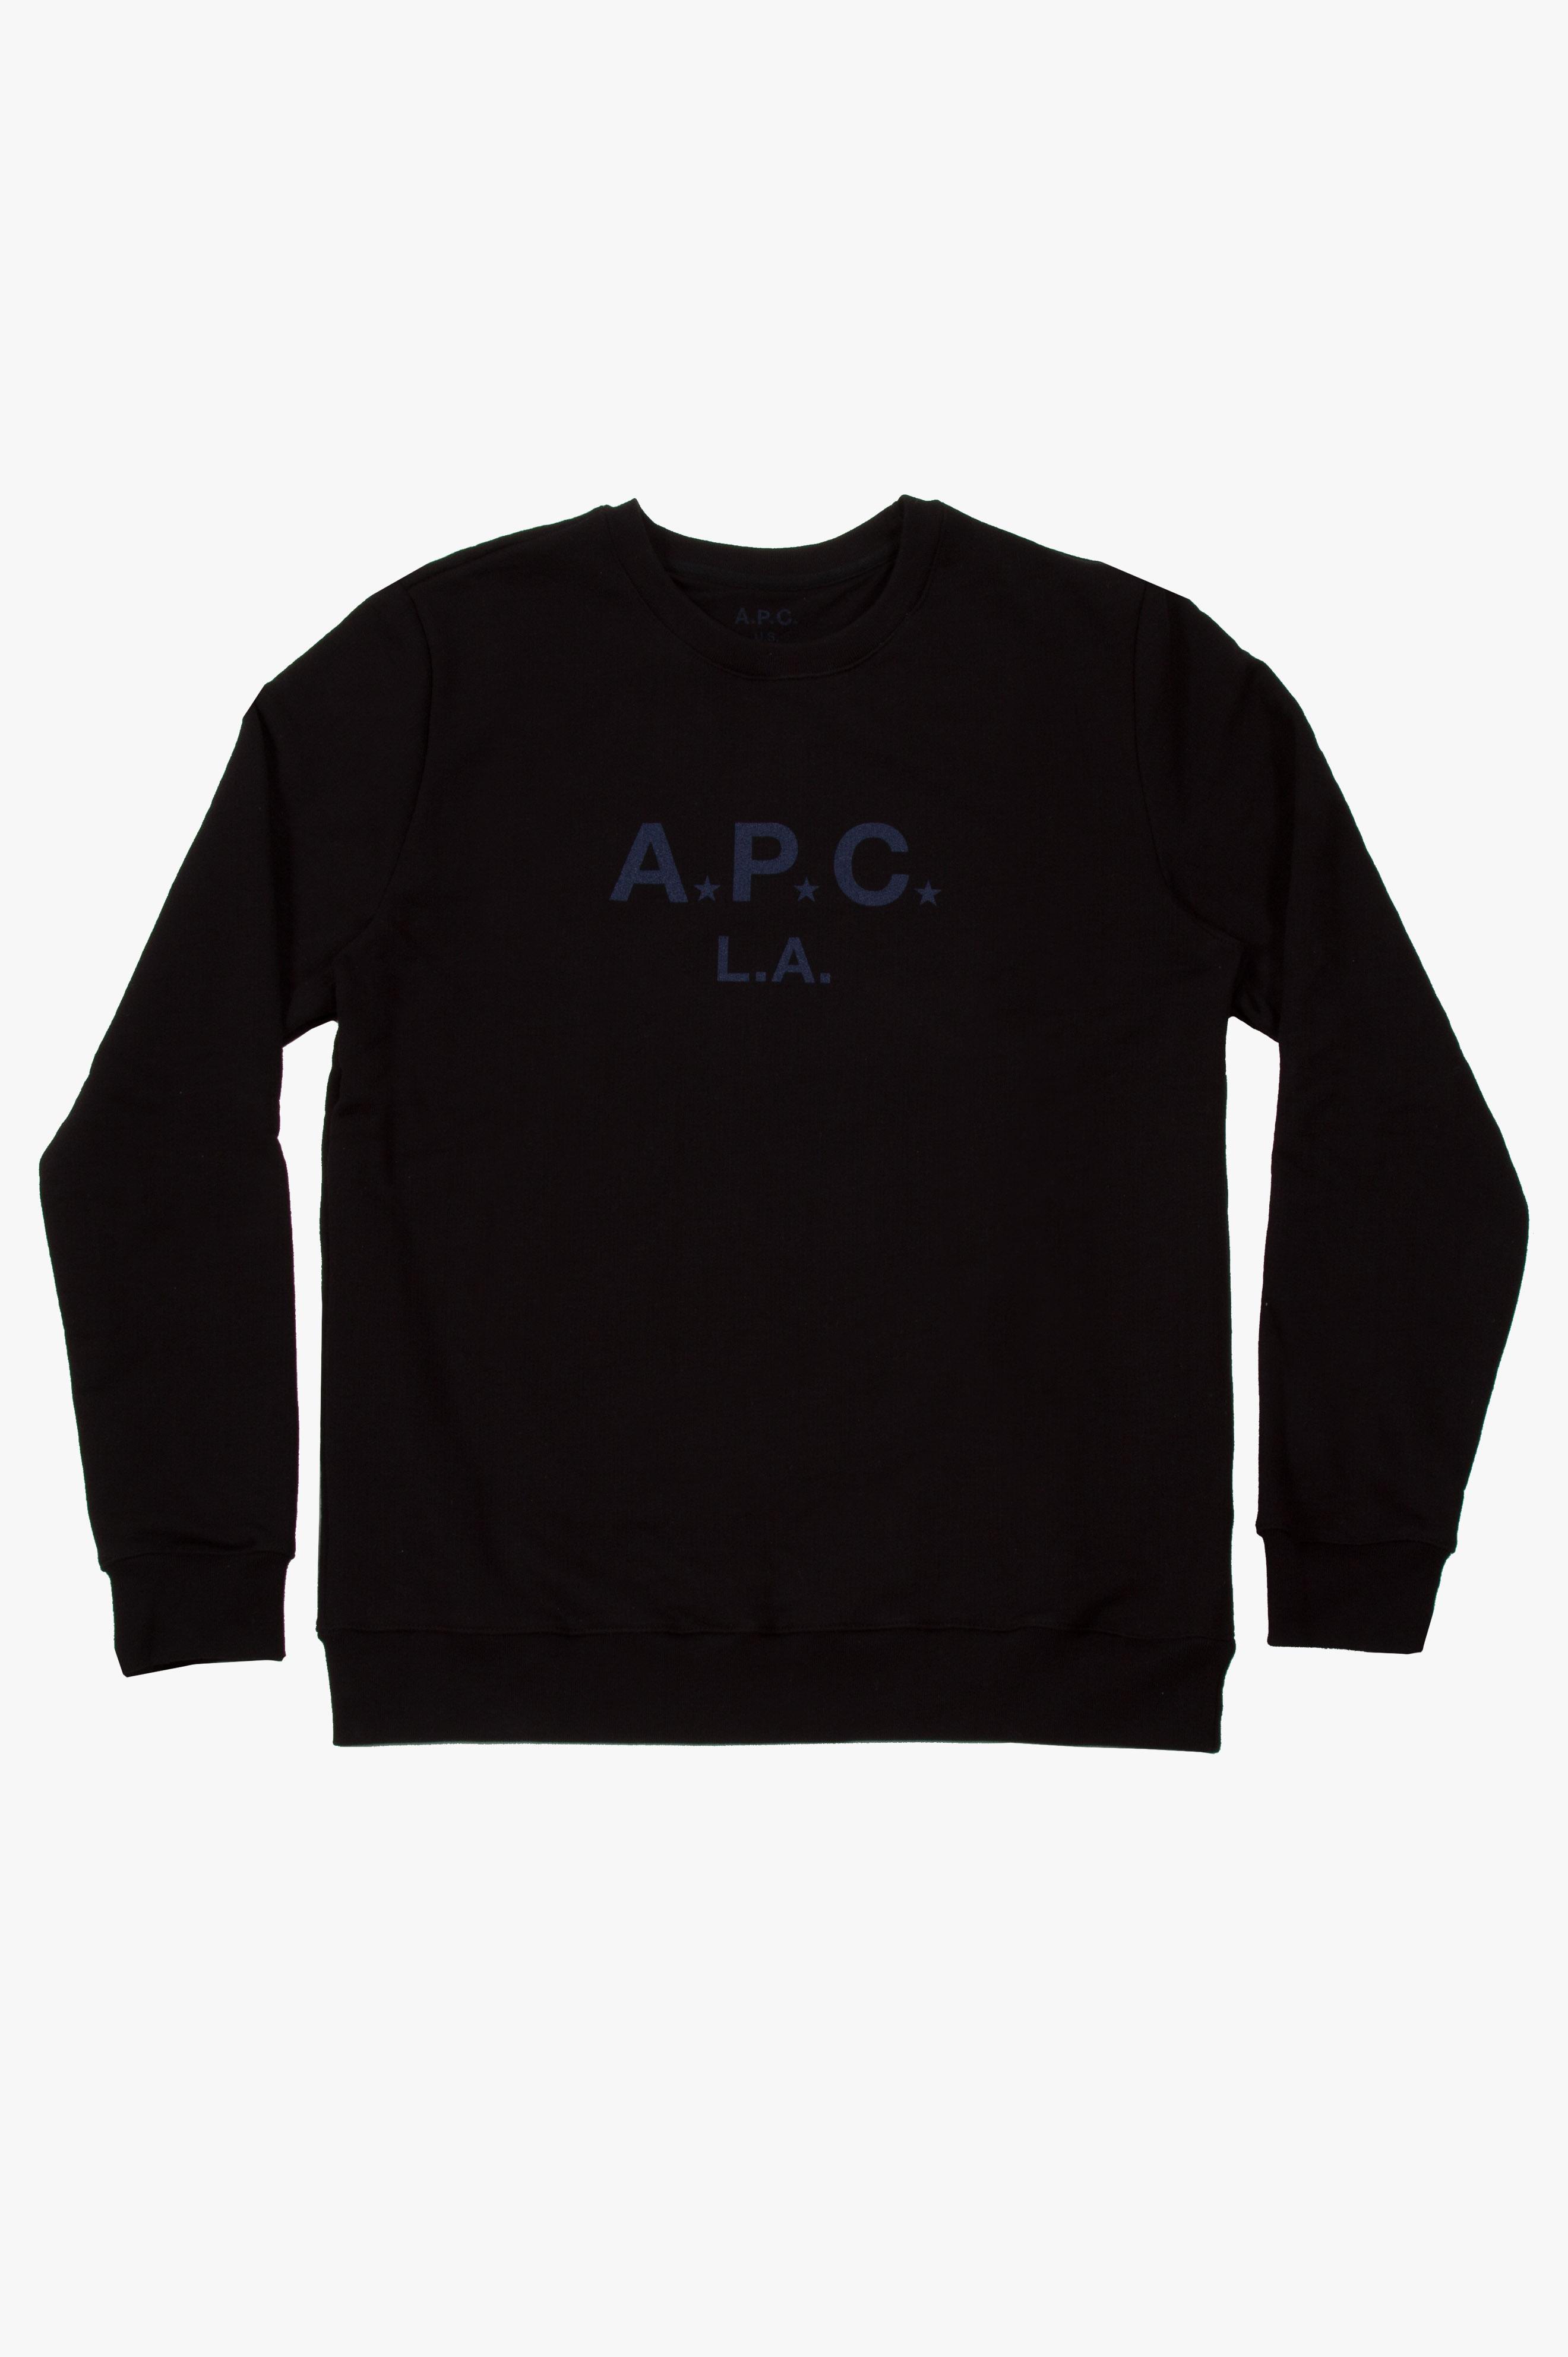 L.A. Sweatshirt